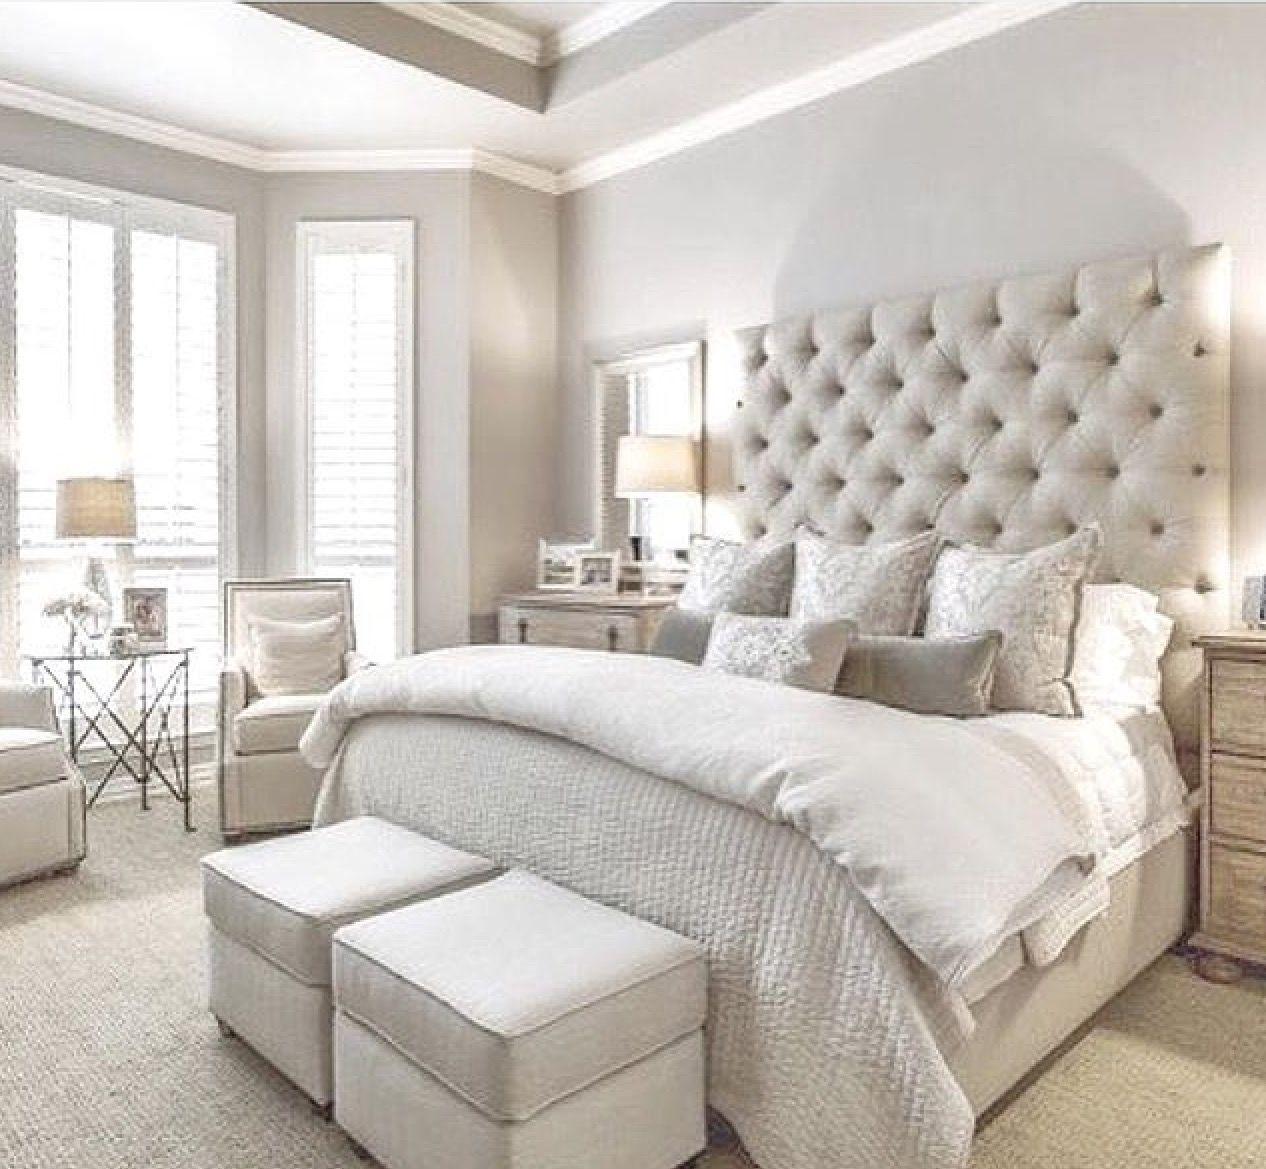 Pin By Maria Esteves On Suite Dreams Beautiful Bedrooms Home Bedroom Luxurious